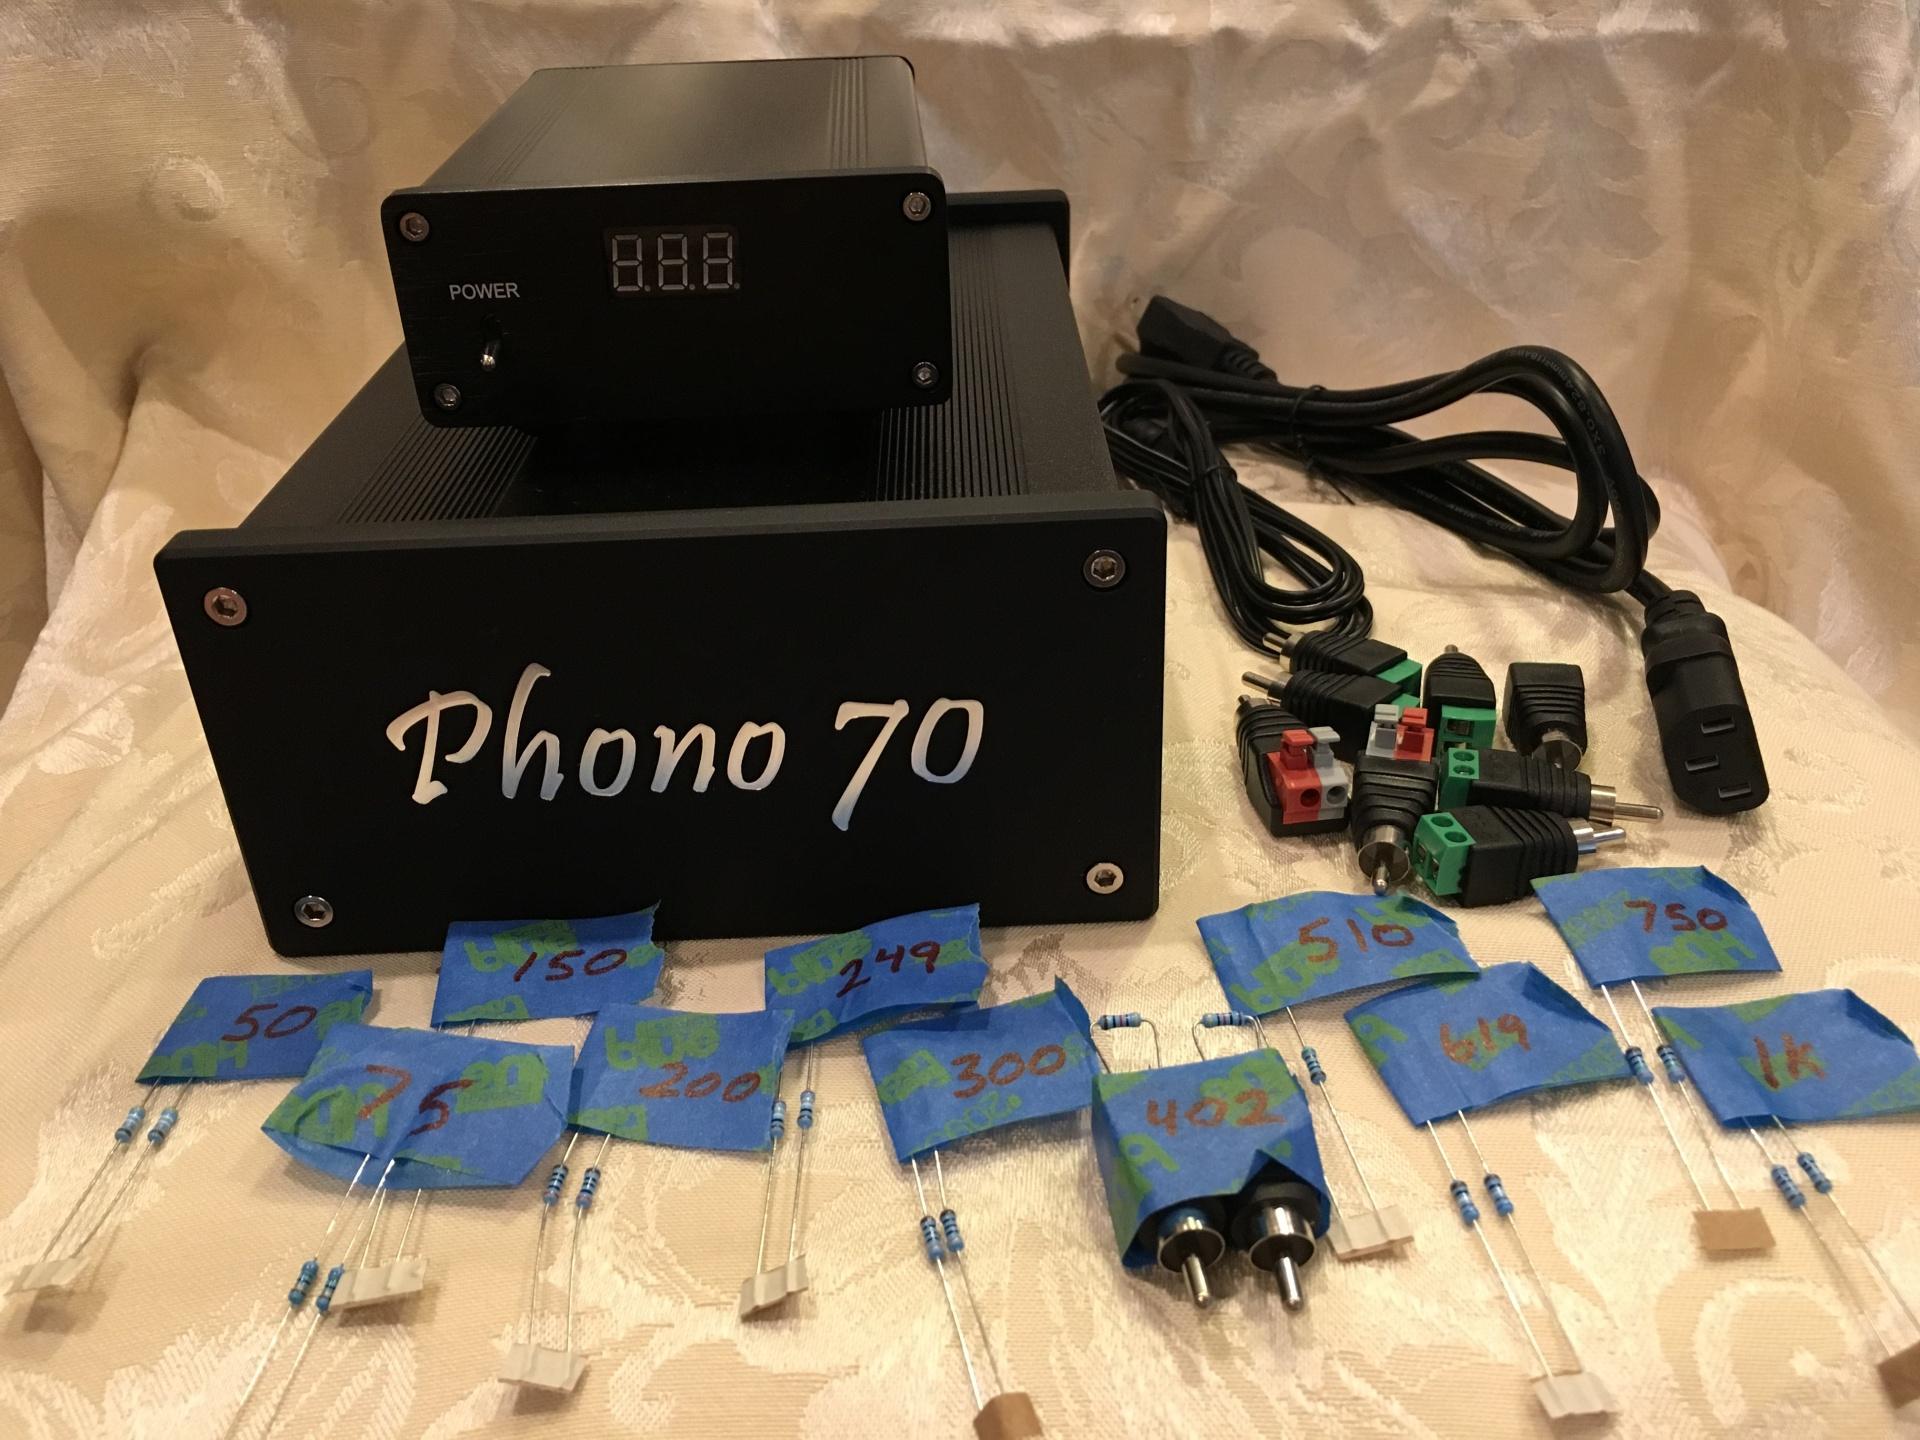 Introducing the Paradox Phono 70